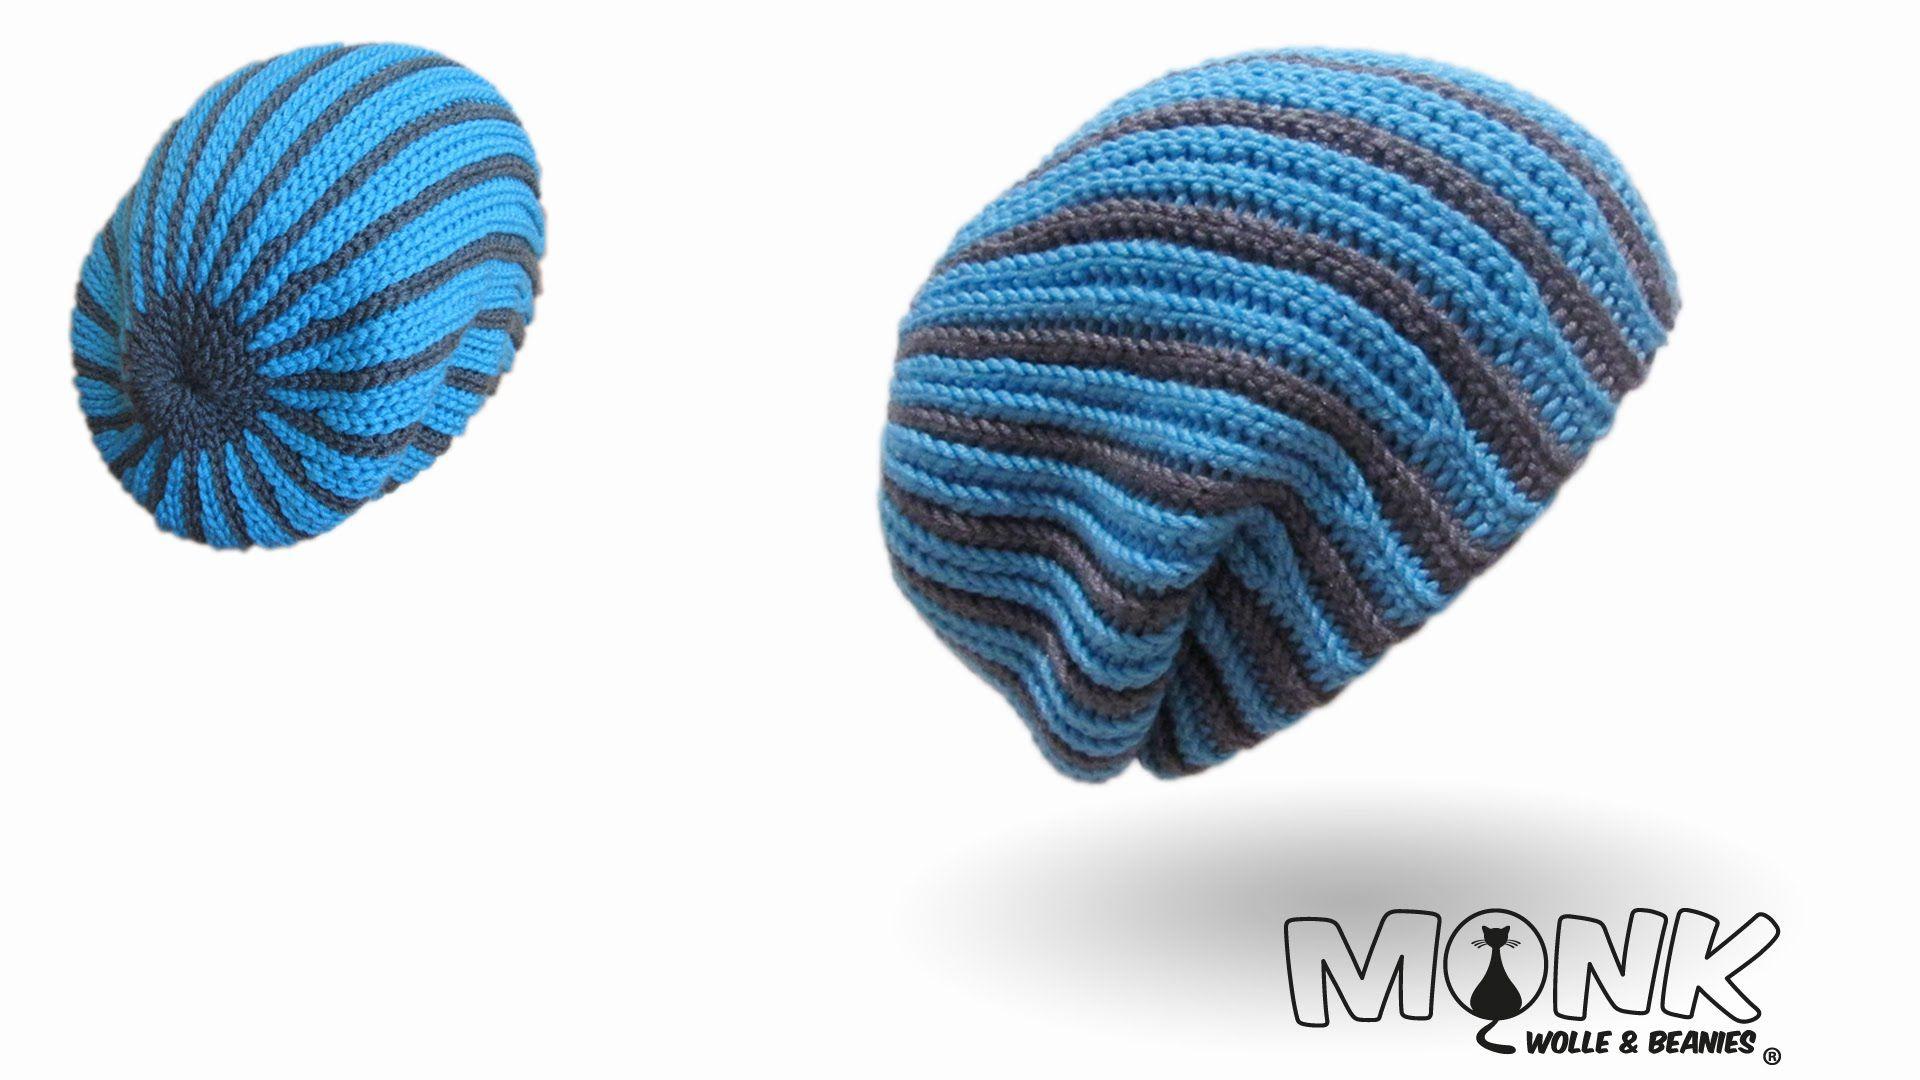 Long Beanie Zweifarbig Bosnisch Häkeln Mütze Häkeln Kettmaschen